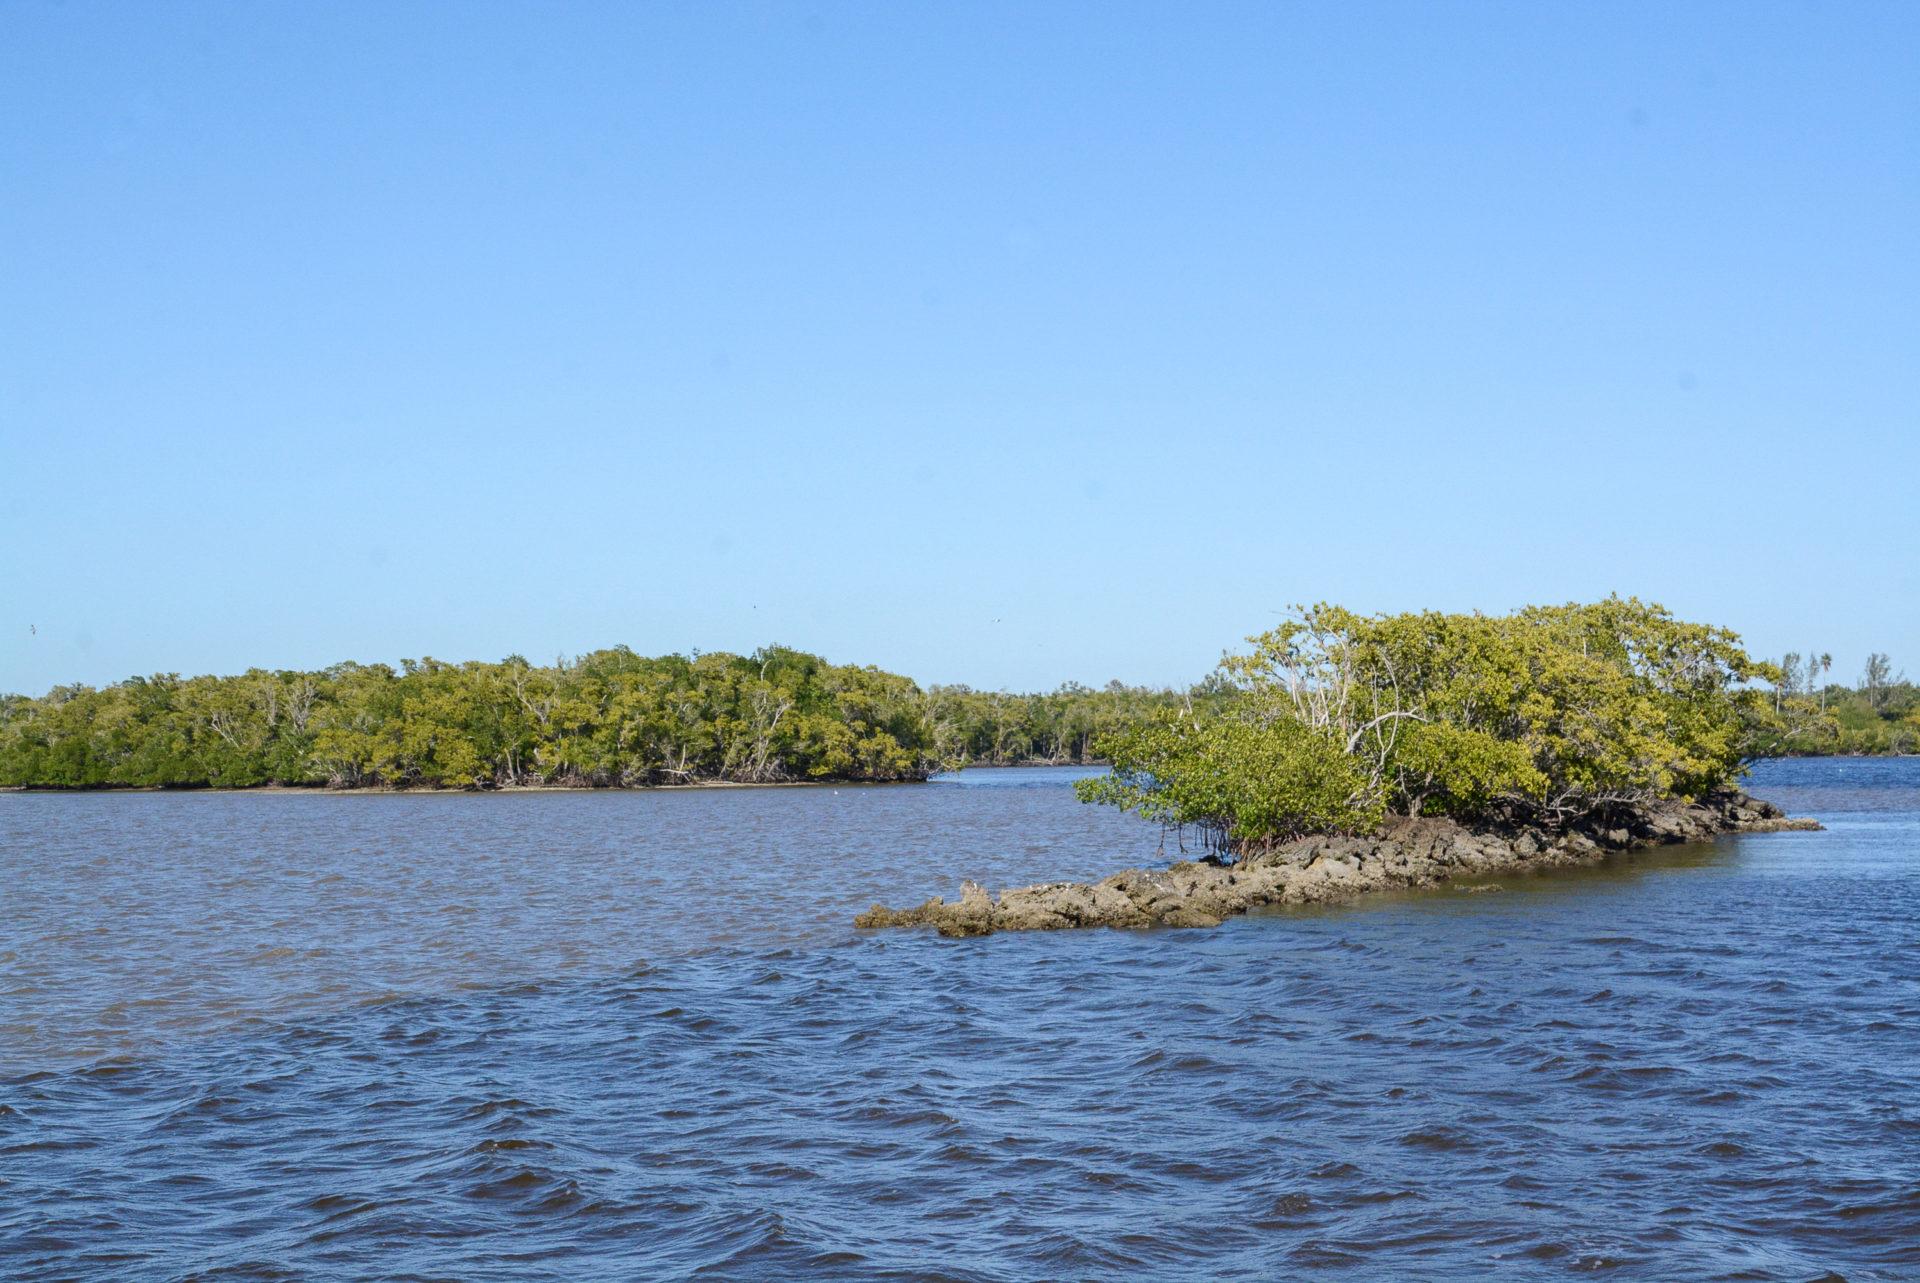 Mangroveninseln in den Everglades in Florida